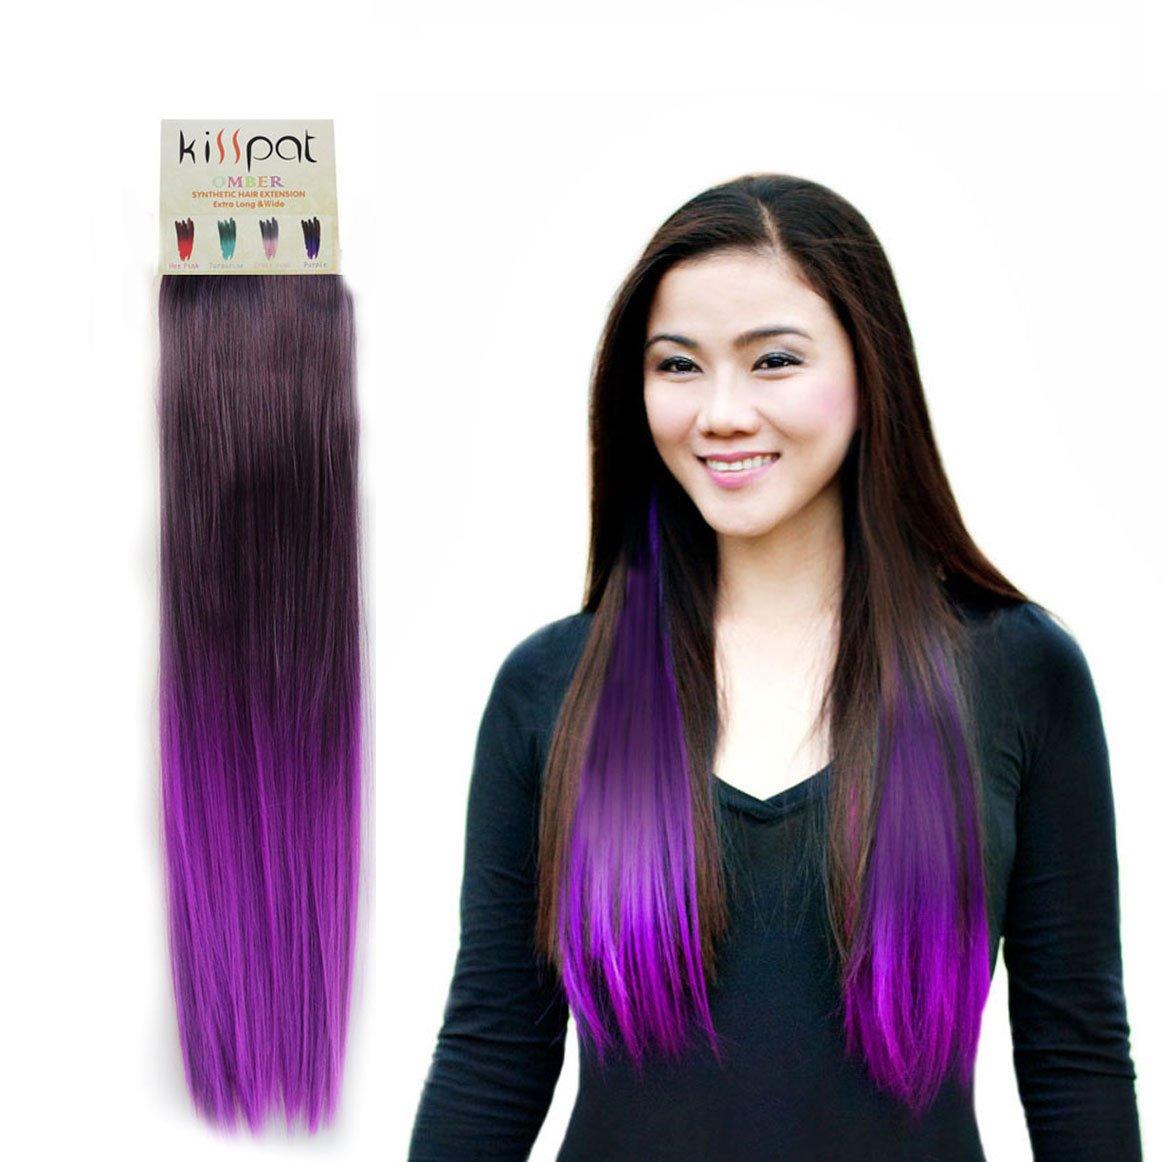 Amazon.com : KISSPAT Turquoise Fashion Ombre Dip Dyed ...